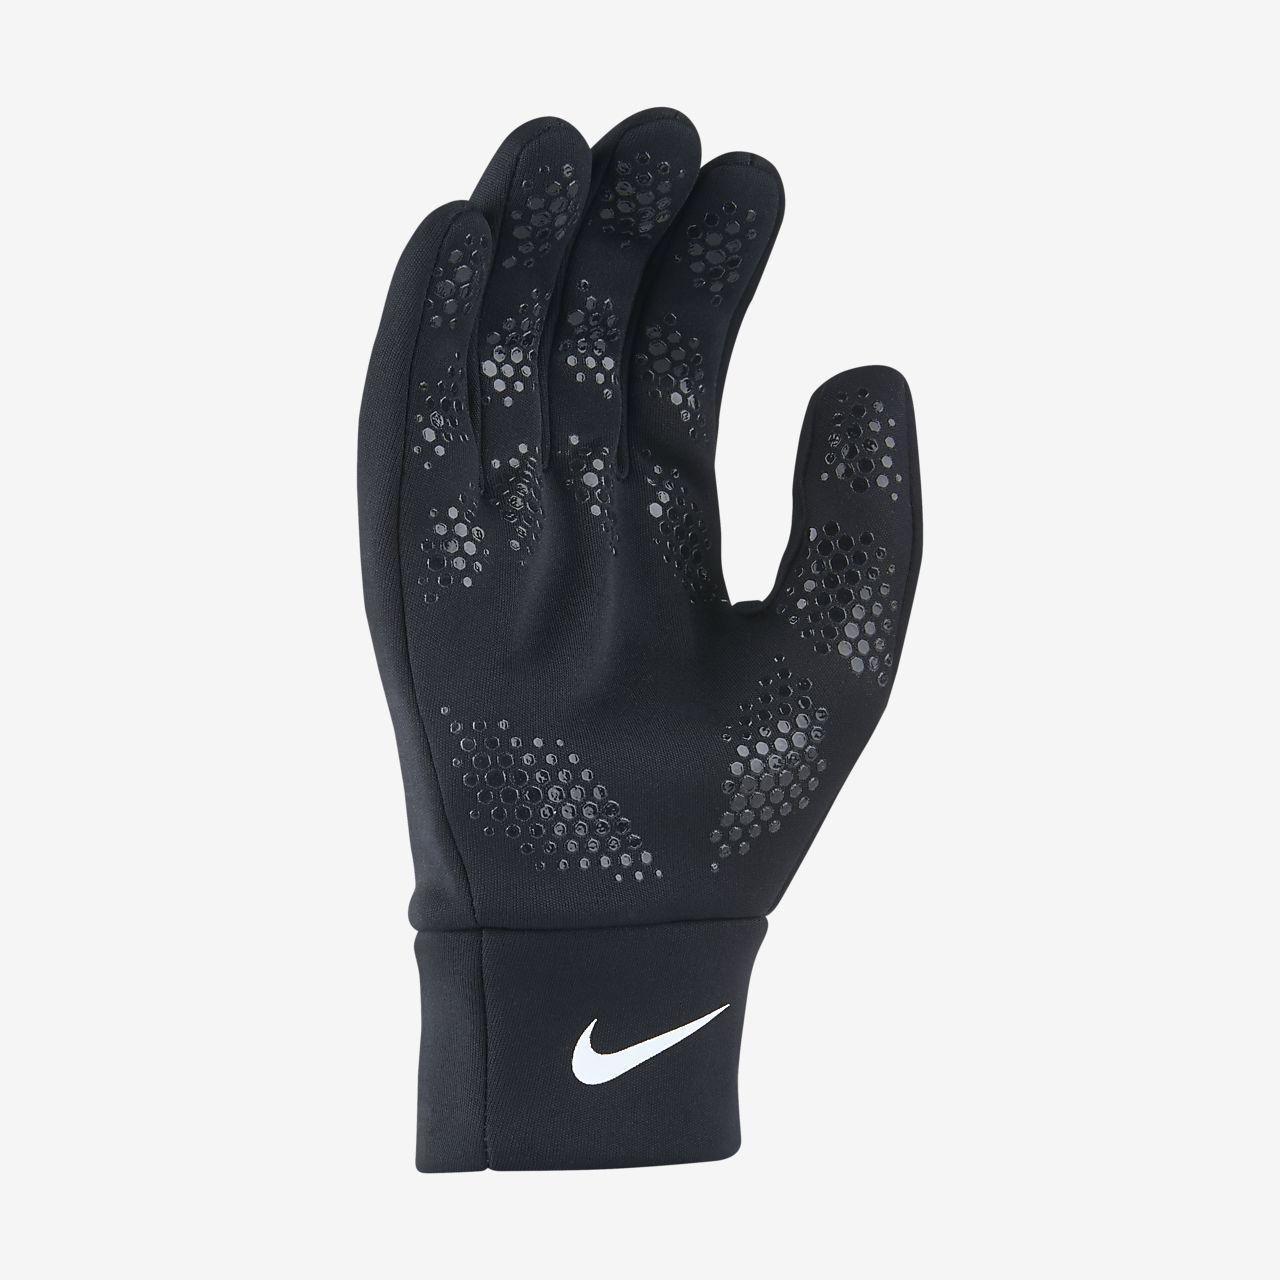 ... Nike HyperWarm Field Player Kids' Football Gloves